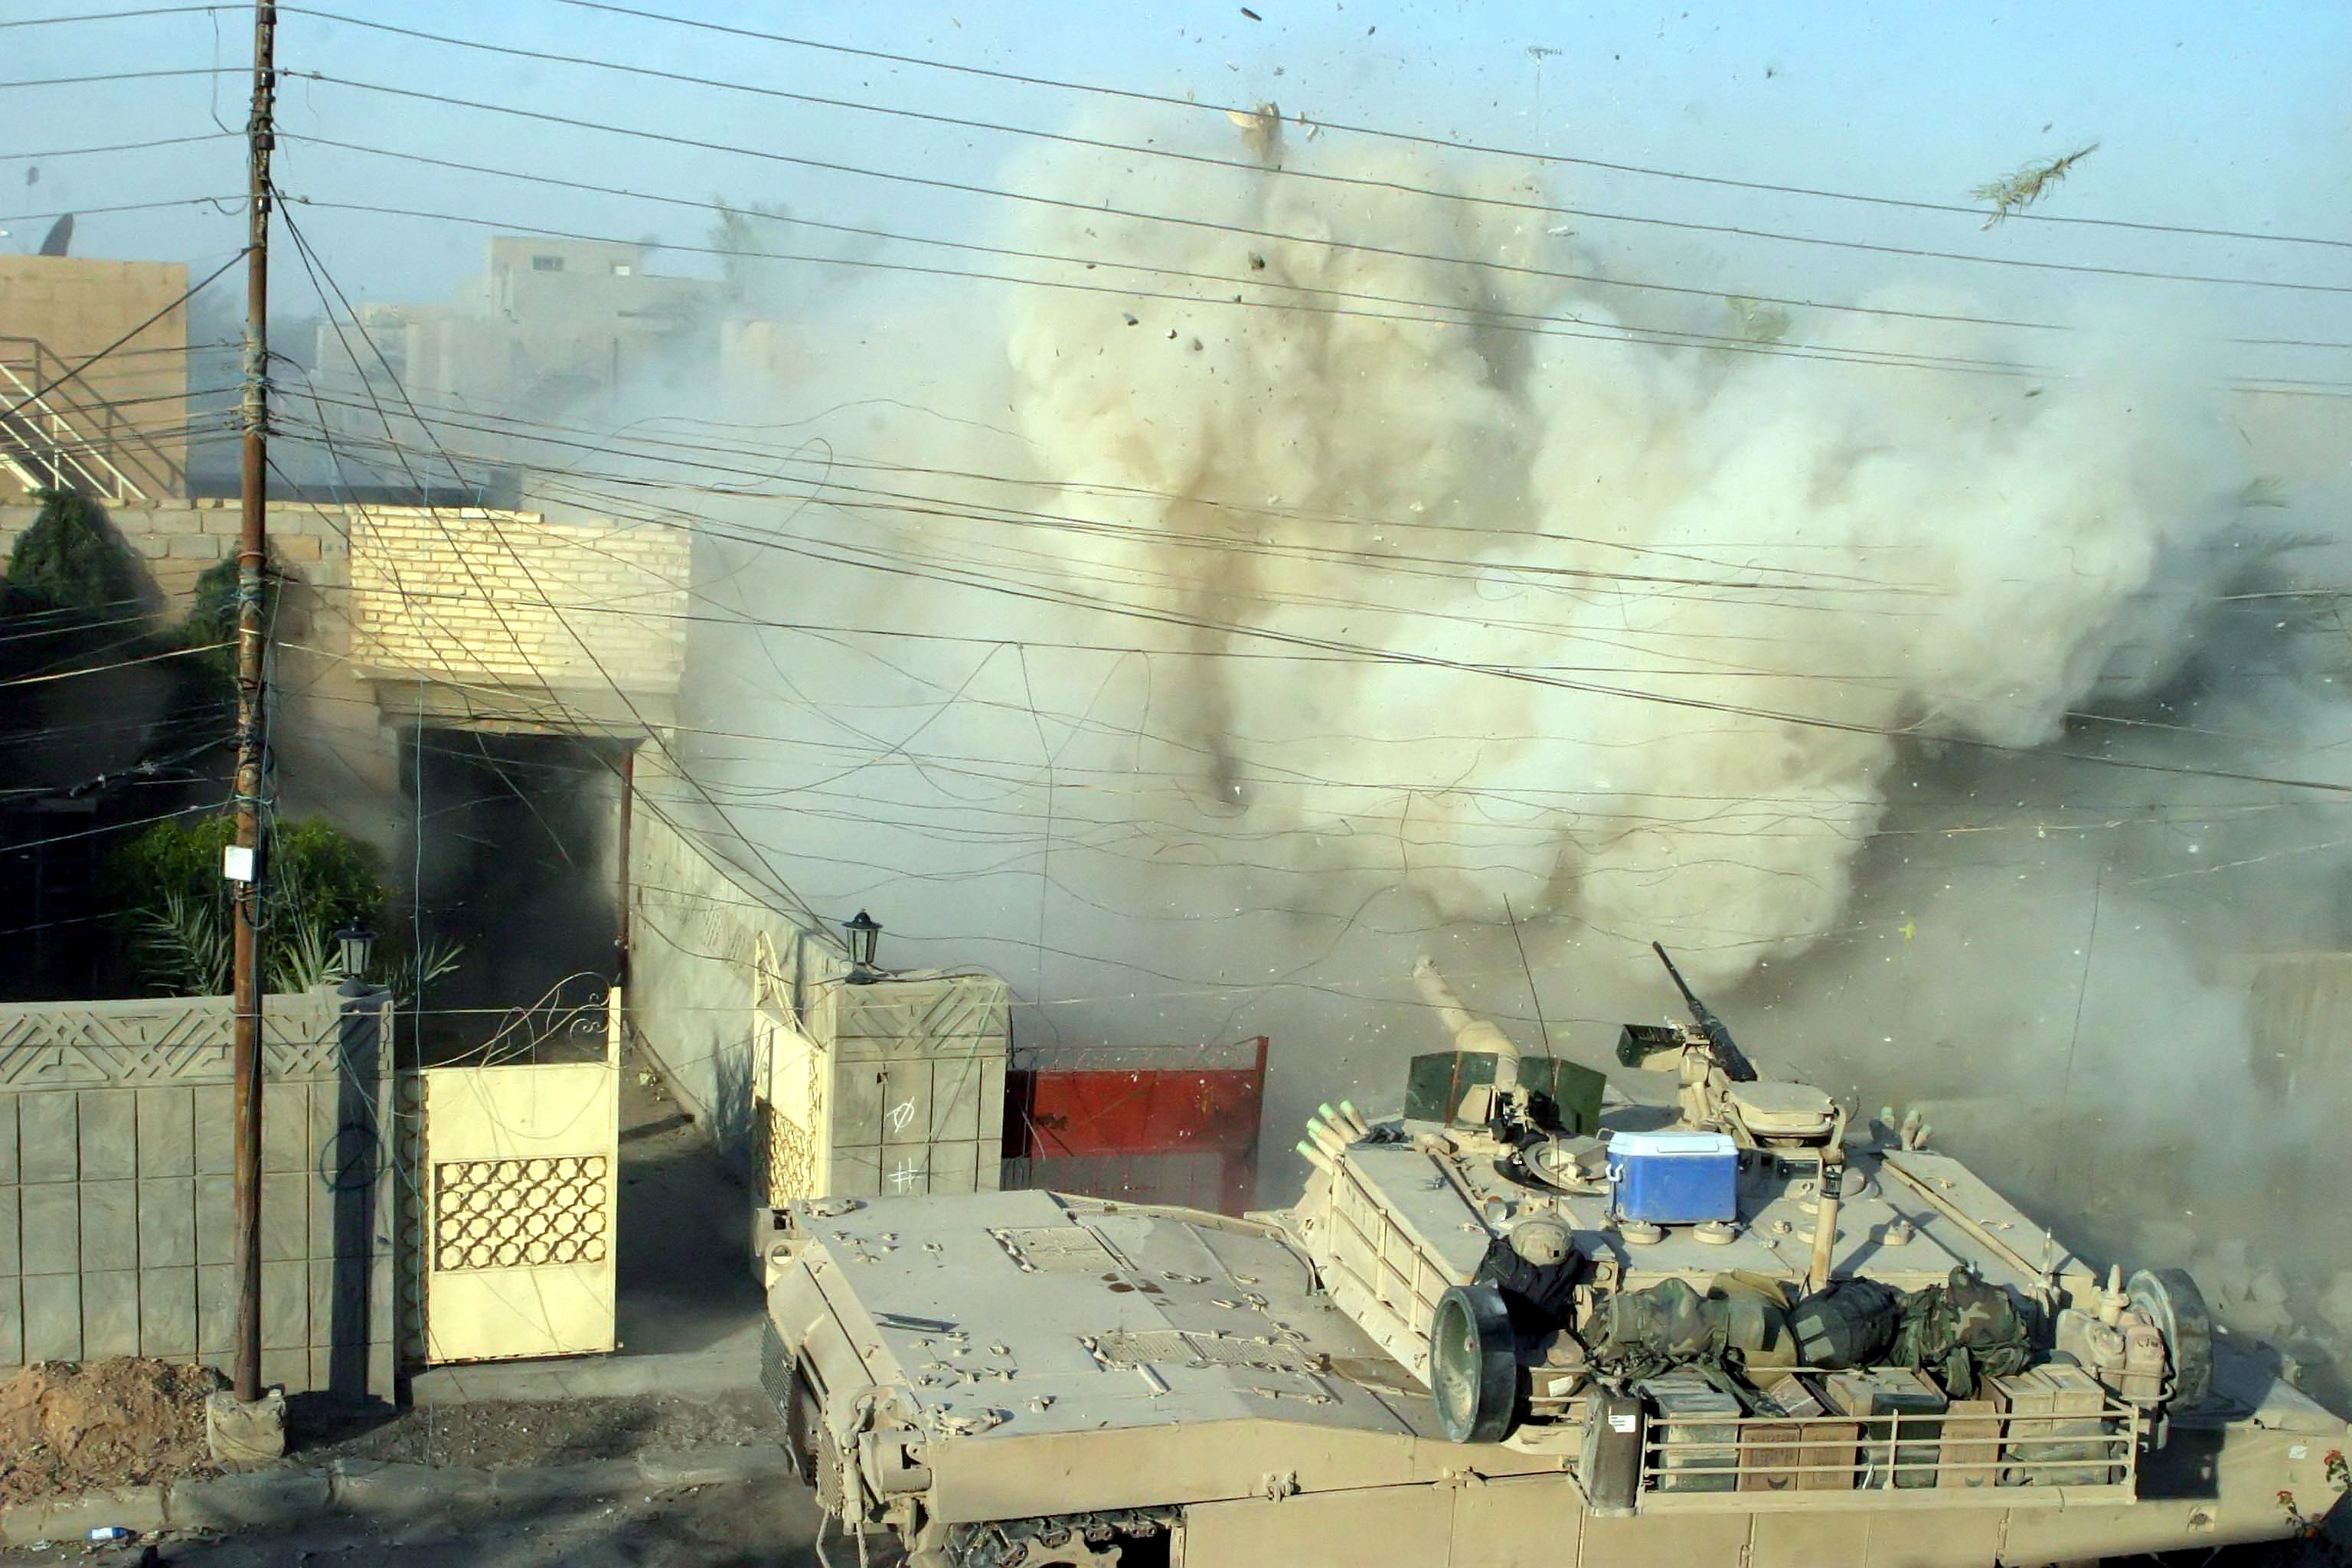 http://fr.academic.ru/pictures/frwiki/70/Fallujah_2004_M1A1_Abrams.jpg